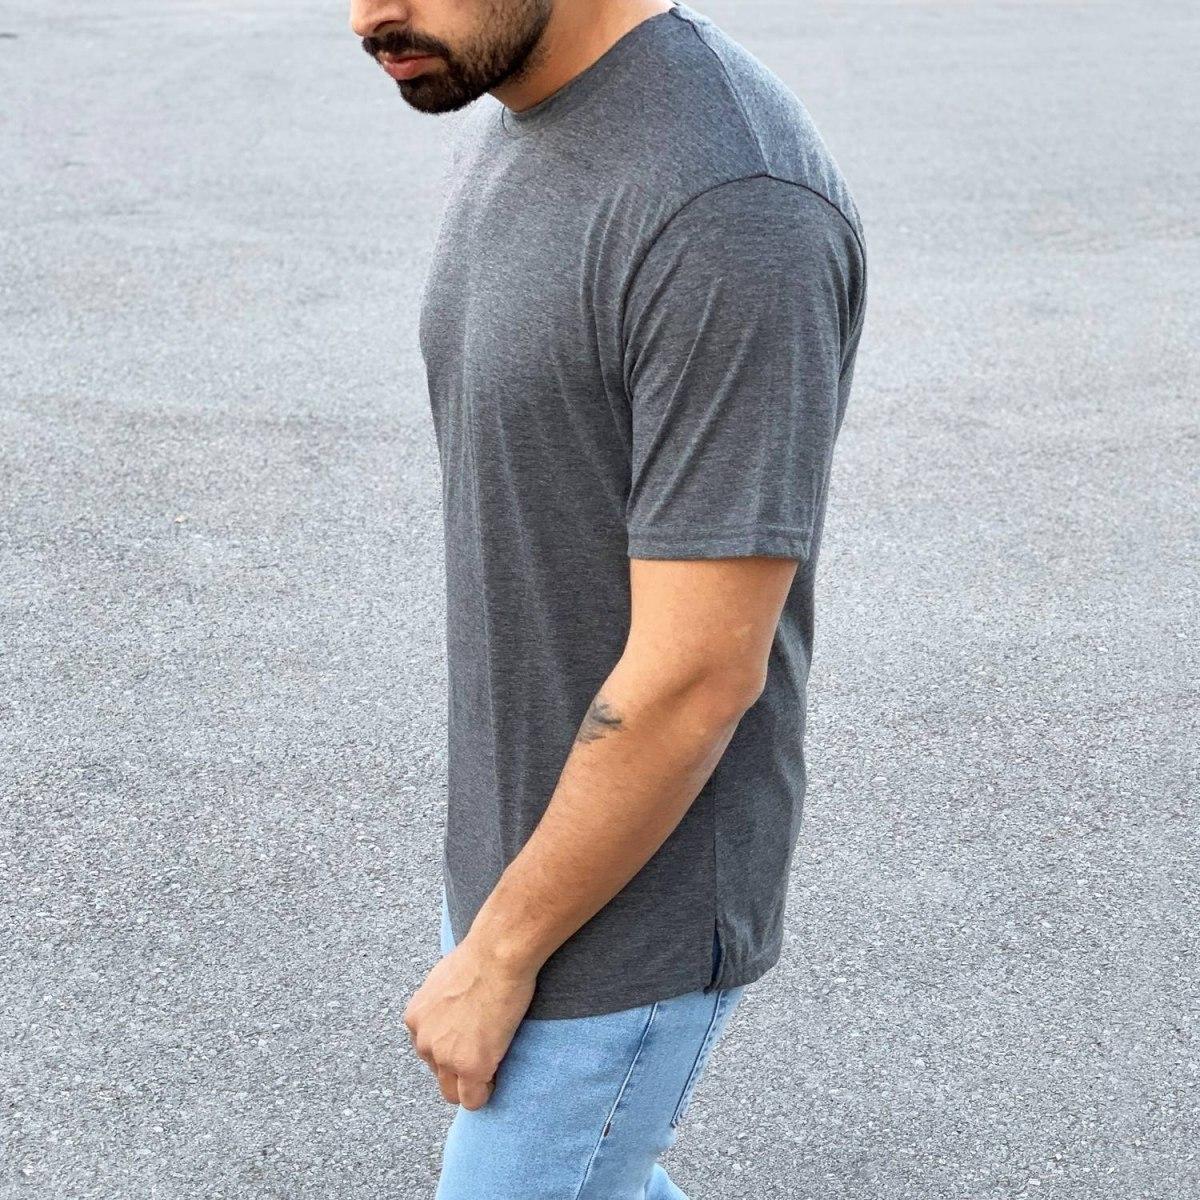 Men's Basic Round Neck T-Shirt In New Gray Mv Premium Brand - 1